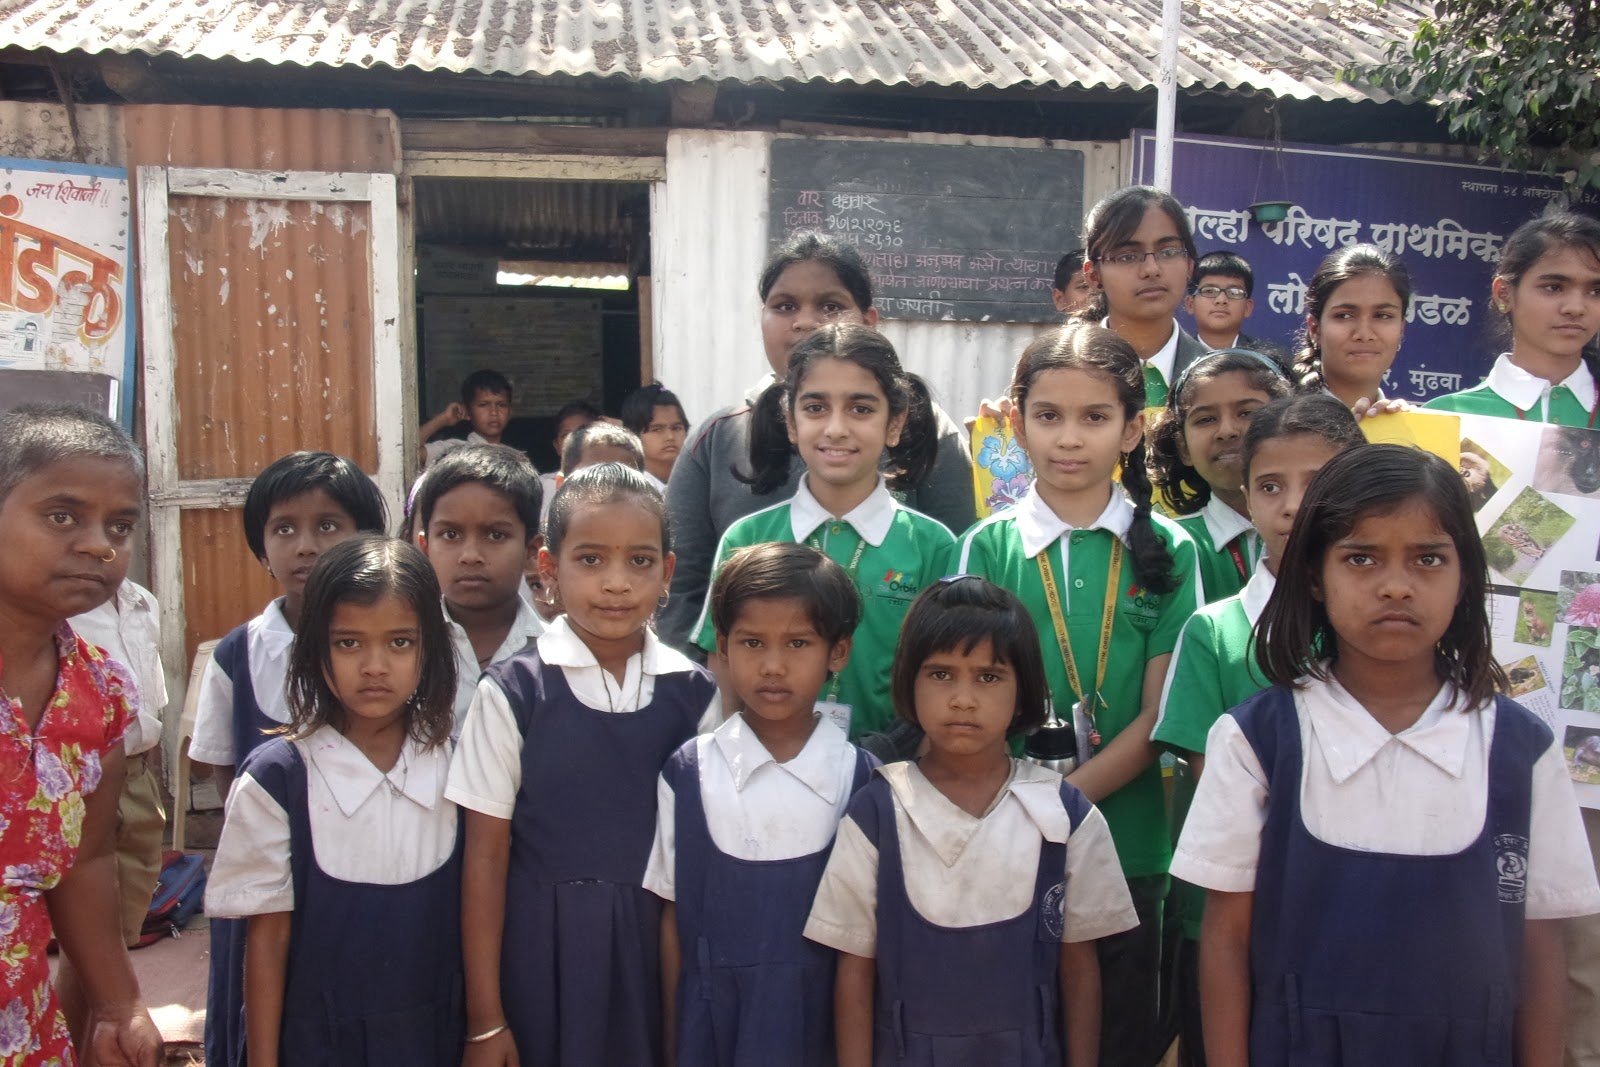 hanuman mitramandal school (2).JPG